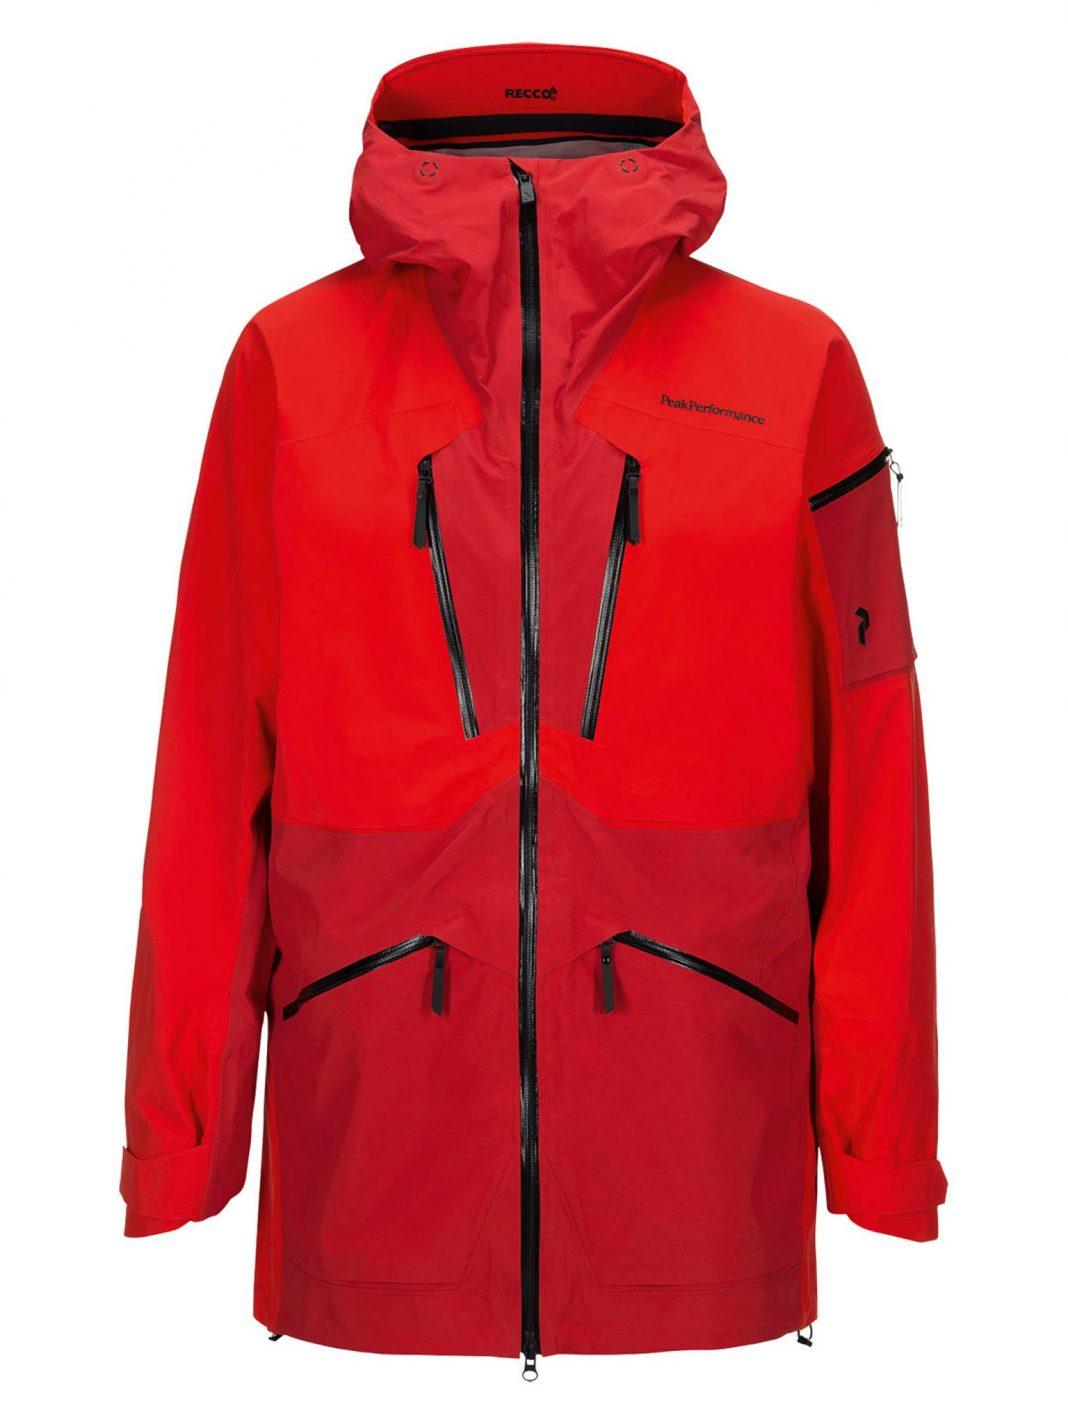 Peak Performance: GTX Vertical Ski Jacket 18/19